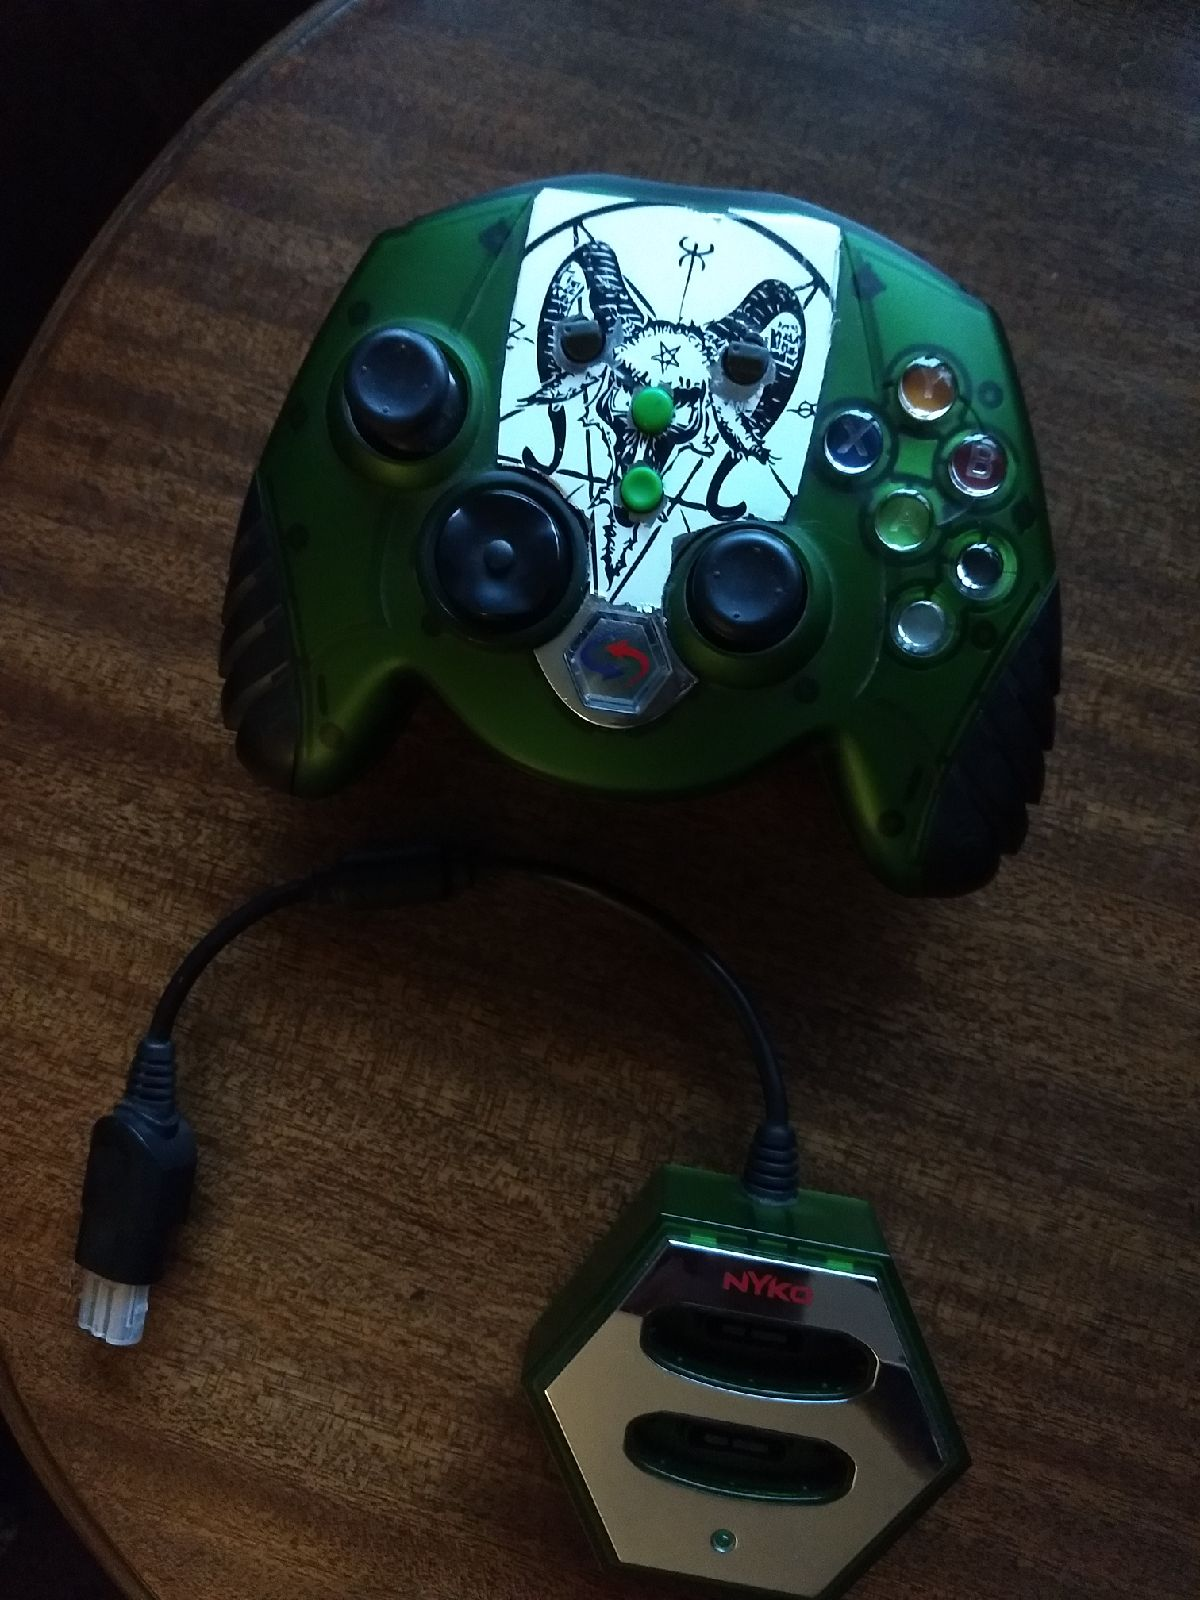 Wireless Xbox Controller